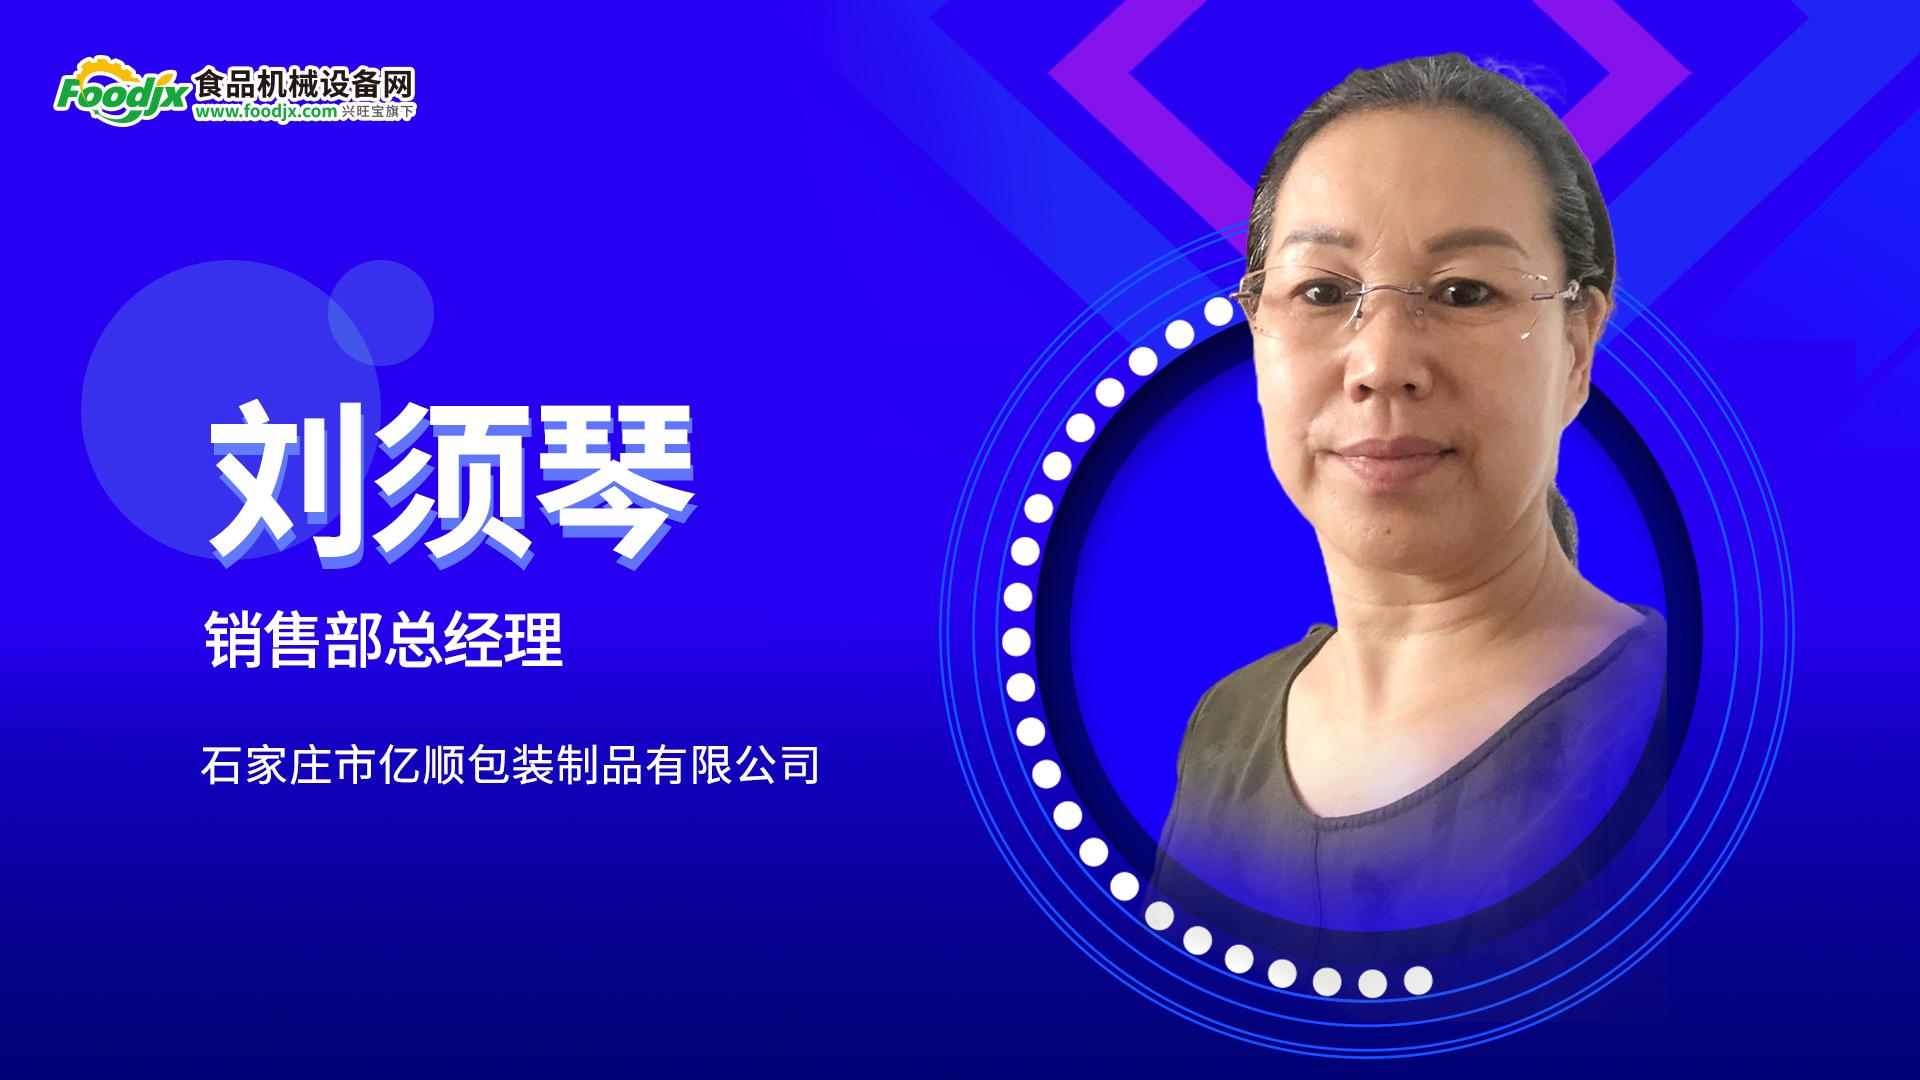 foodjx专访石家庄市亿顺包装制品易胜博娱乐网站